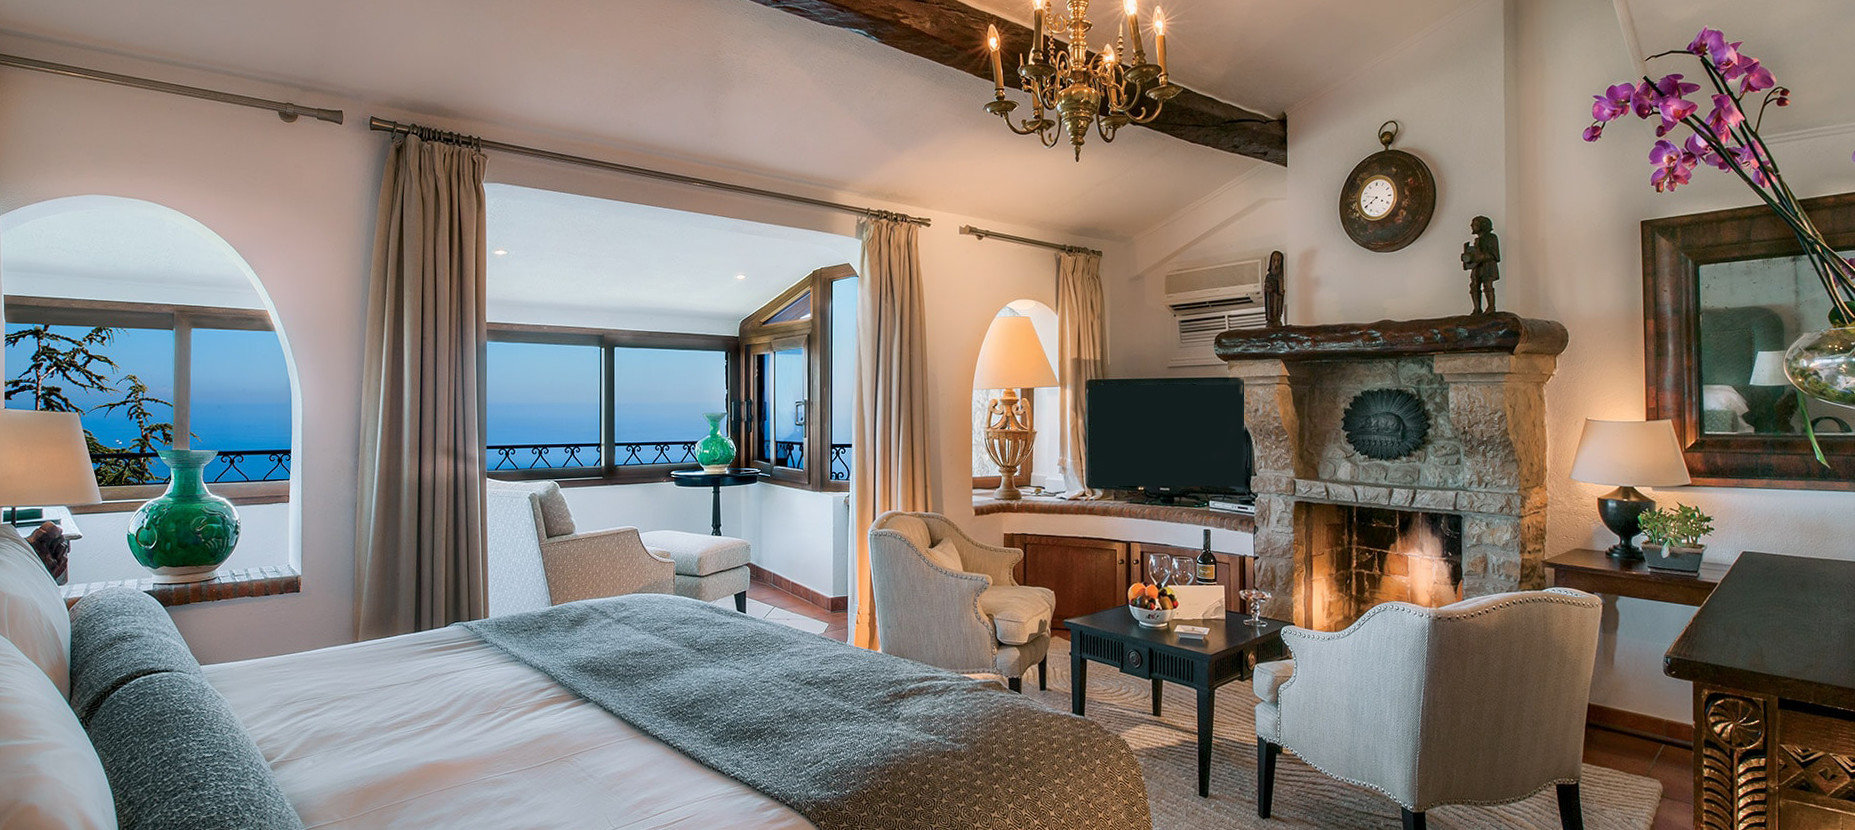 chair property living room home Villa cottage mansion Suite condominium farmhouse Resort